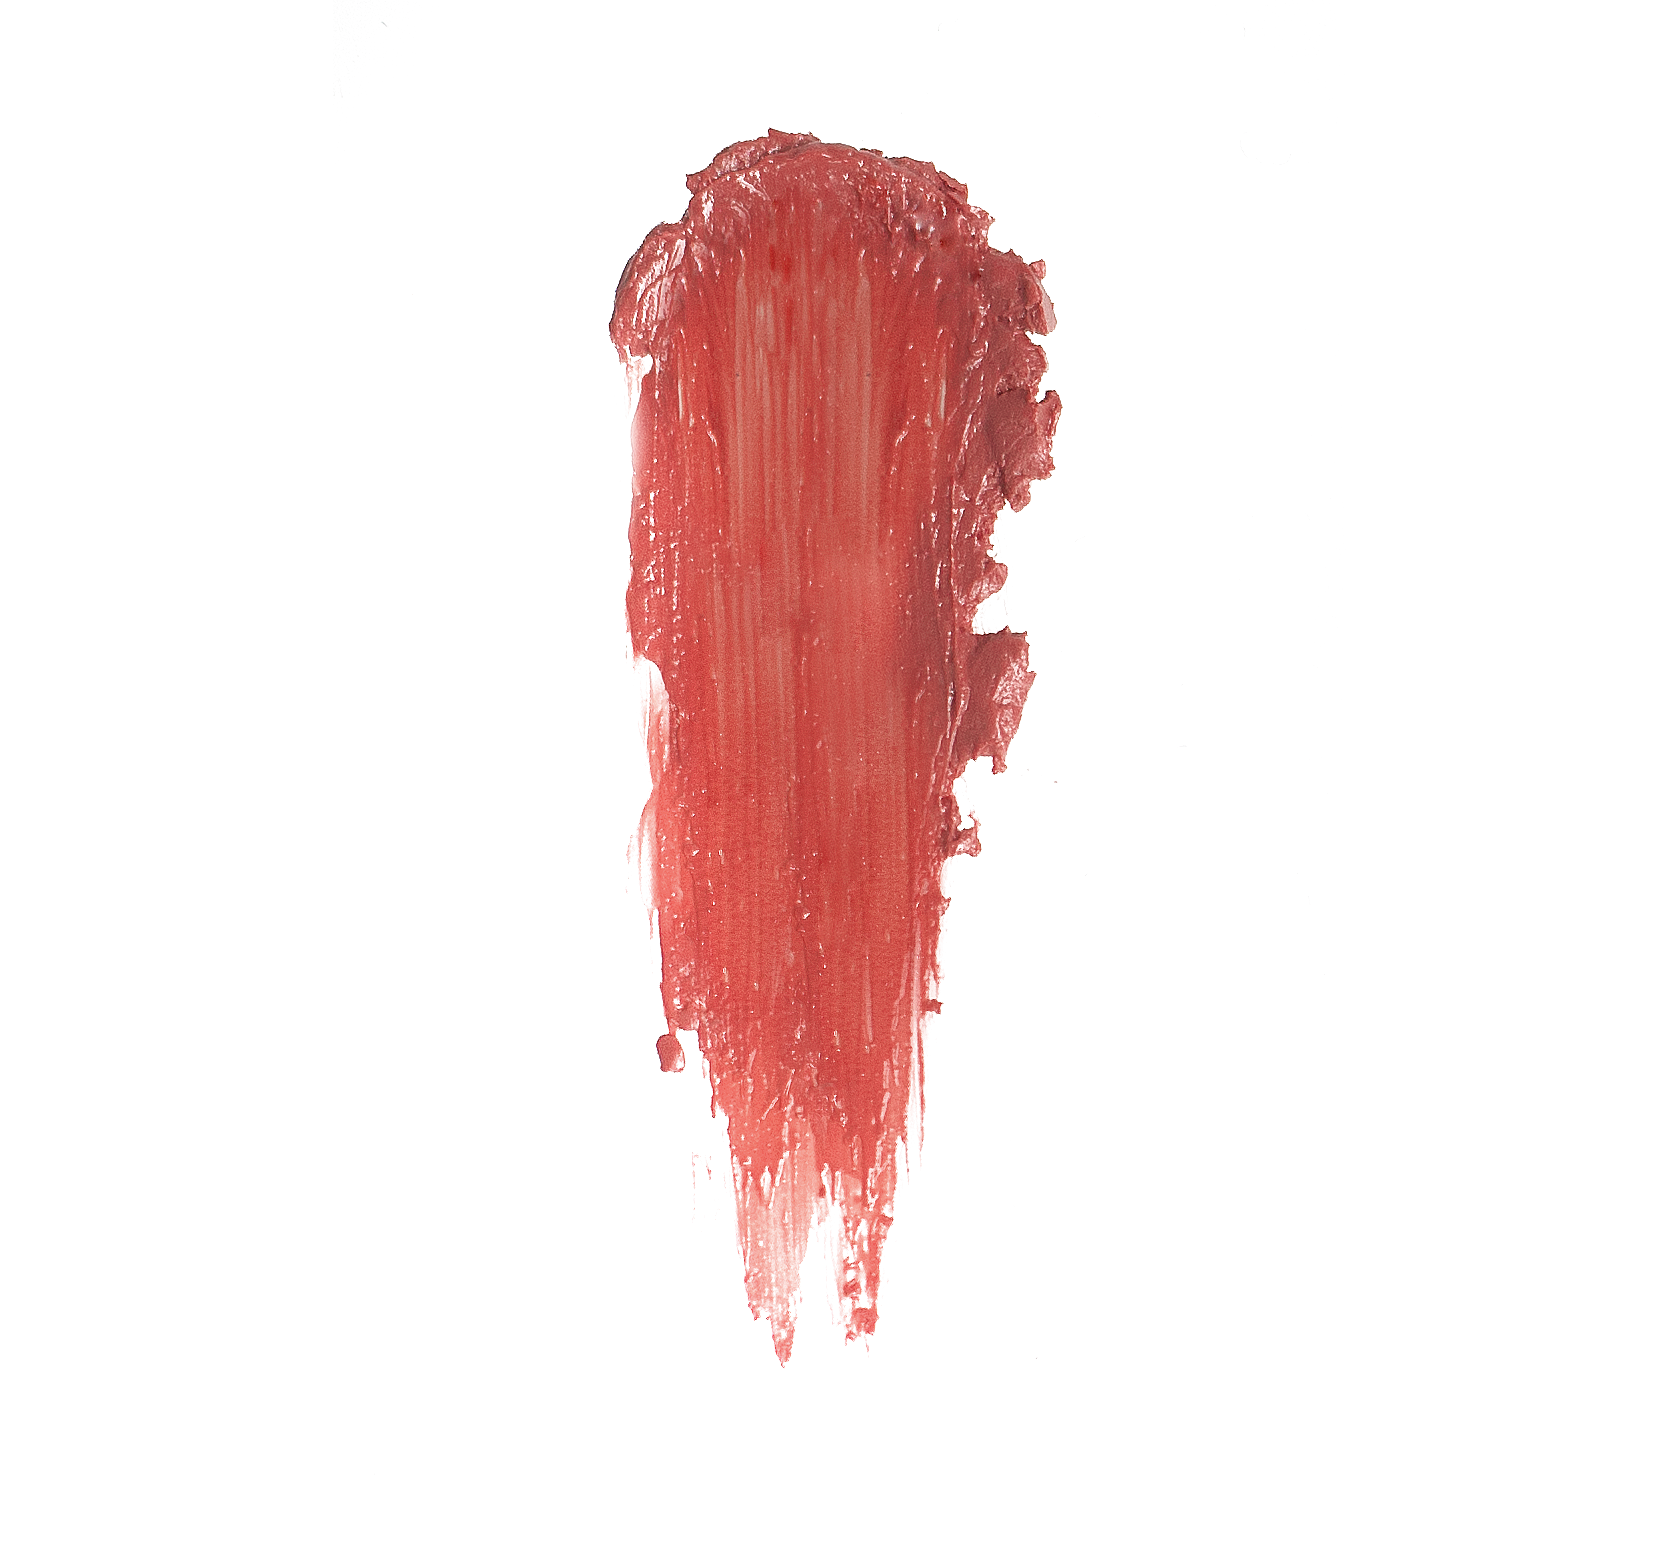 koral_texture.png